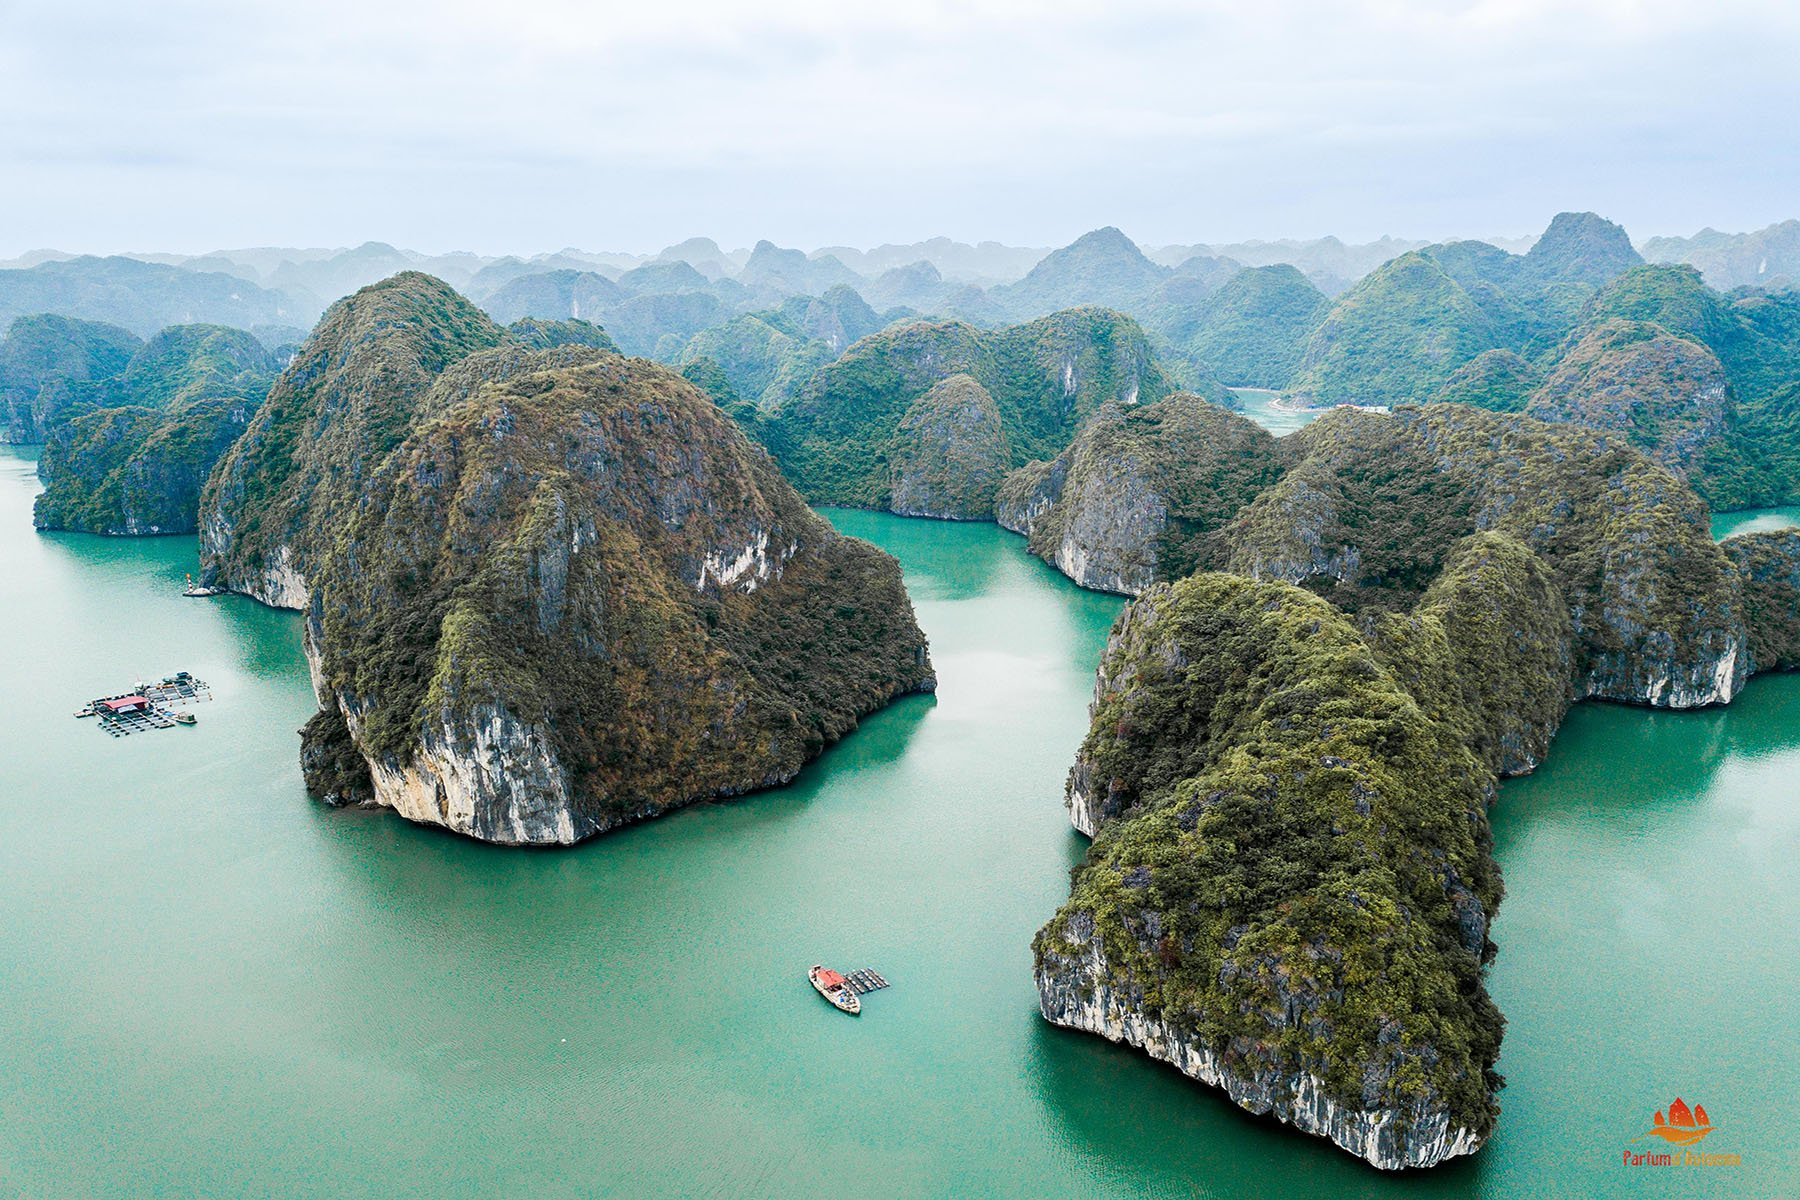 Pitons rocheux vu du ciel, Baie de Lan Ha, Vietnam